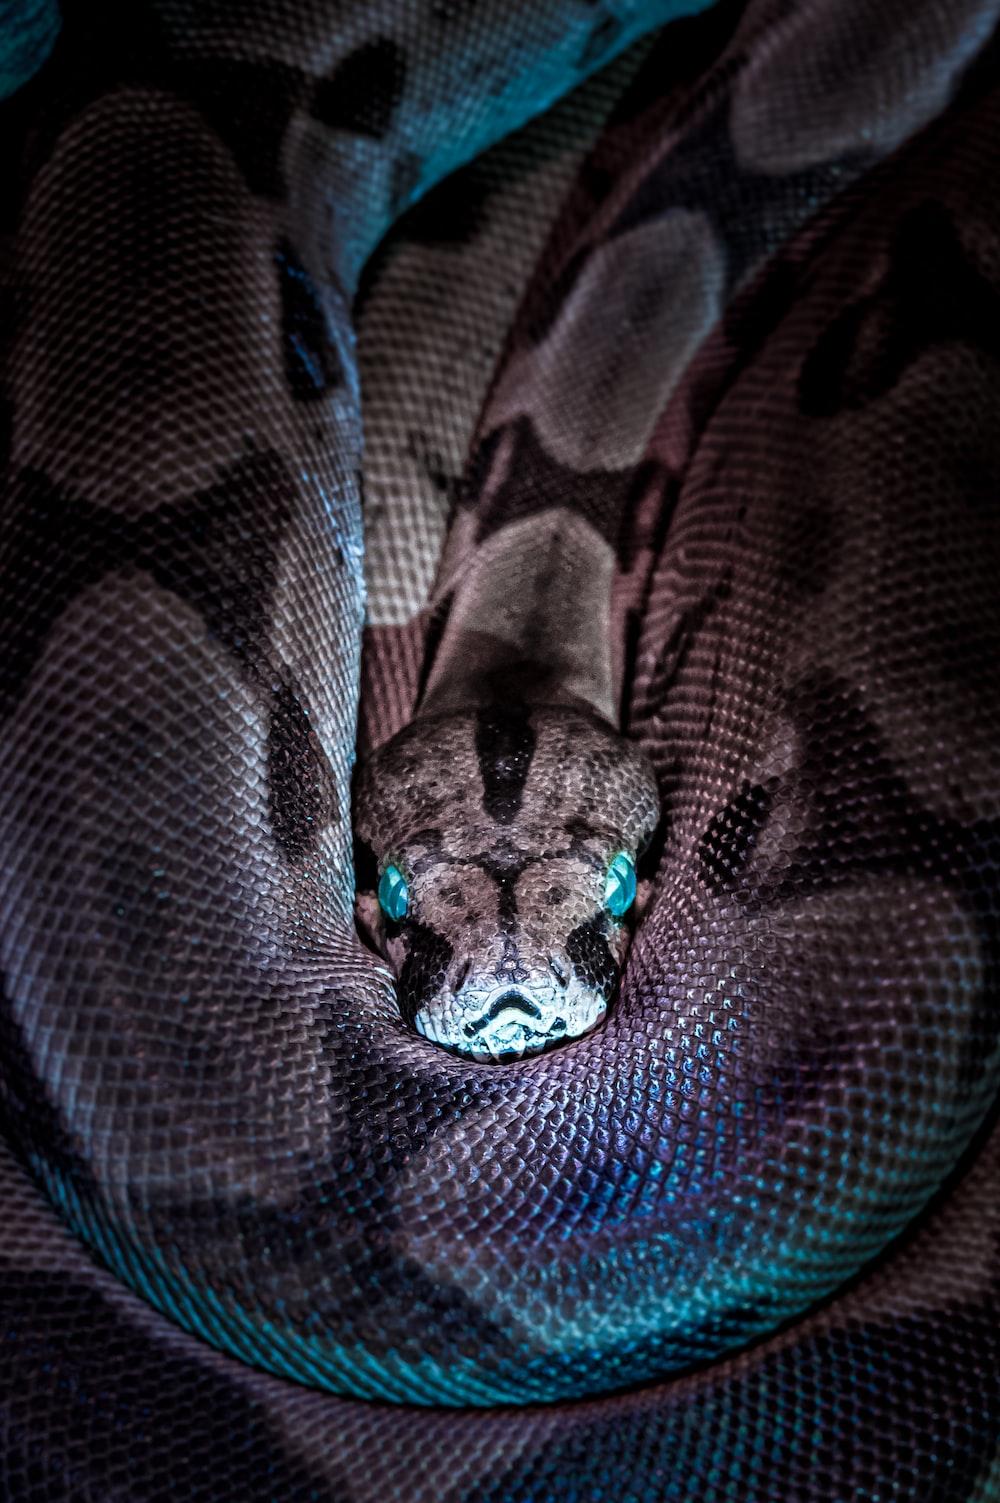 brown and black snake